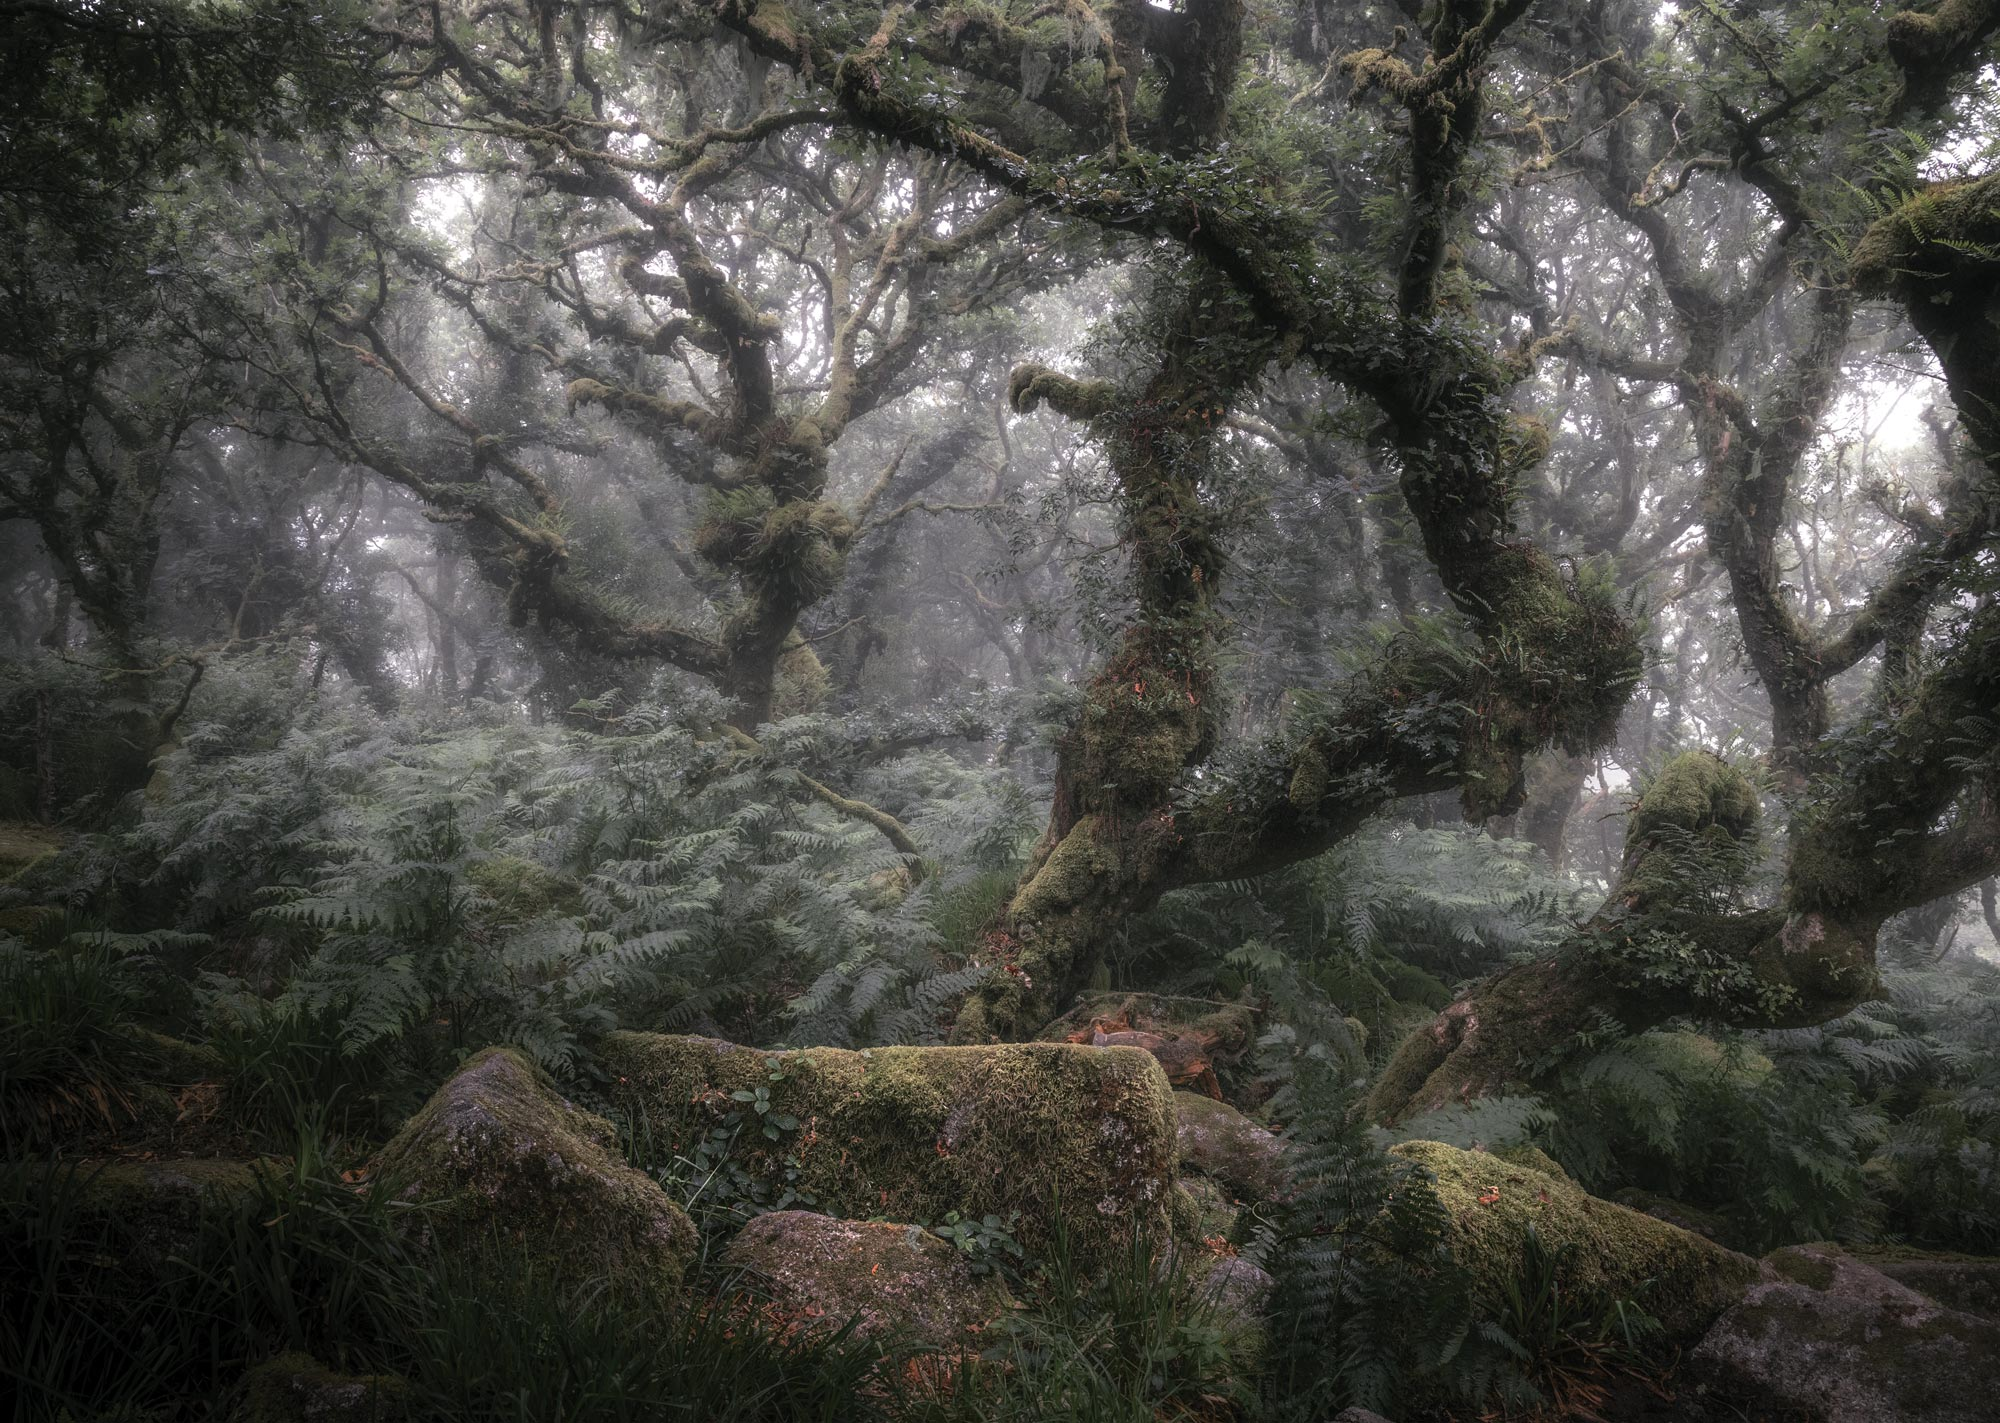 Wistman's Wood | Little Eccentrics